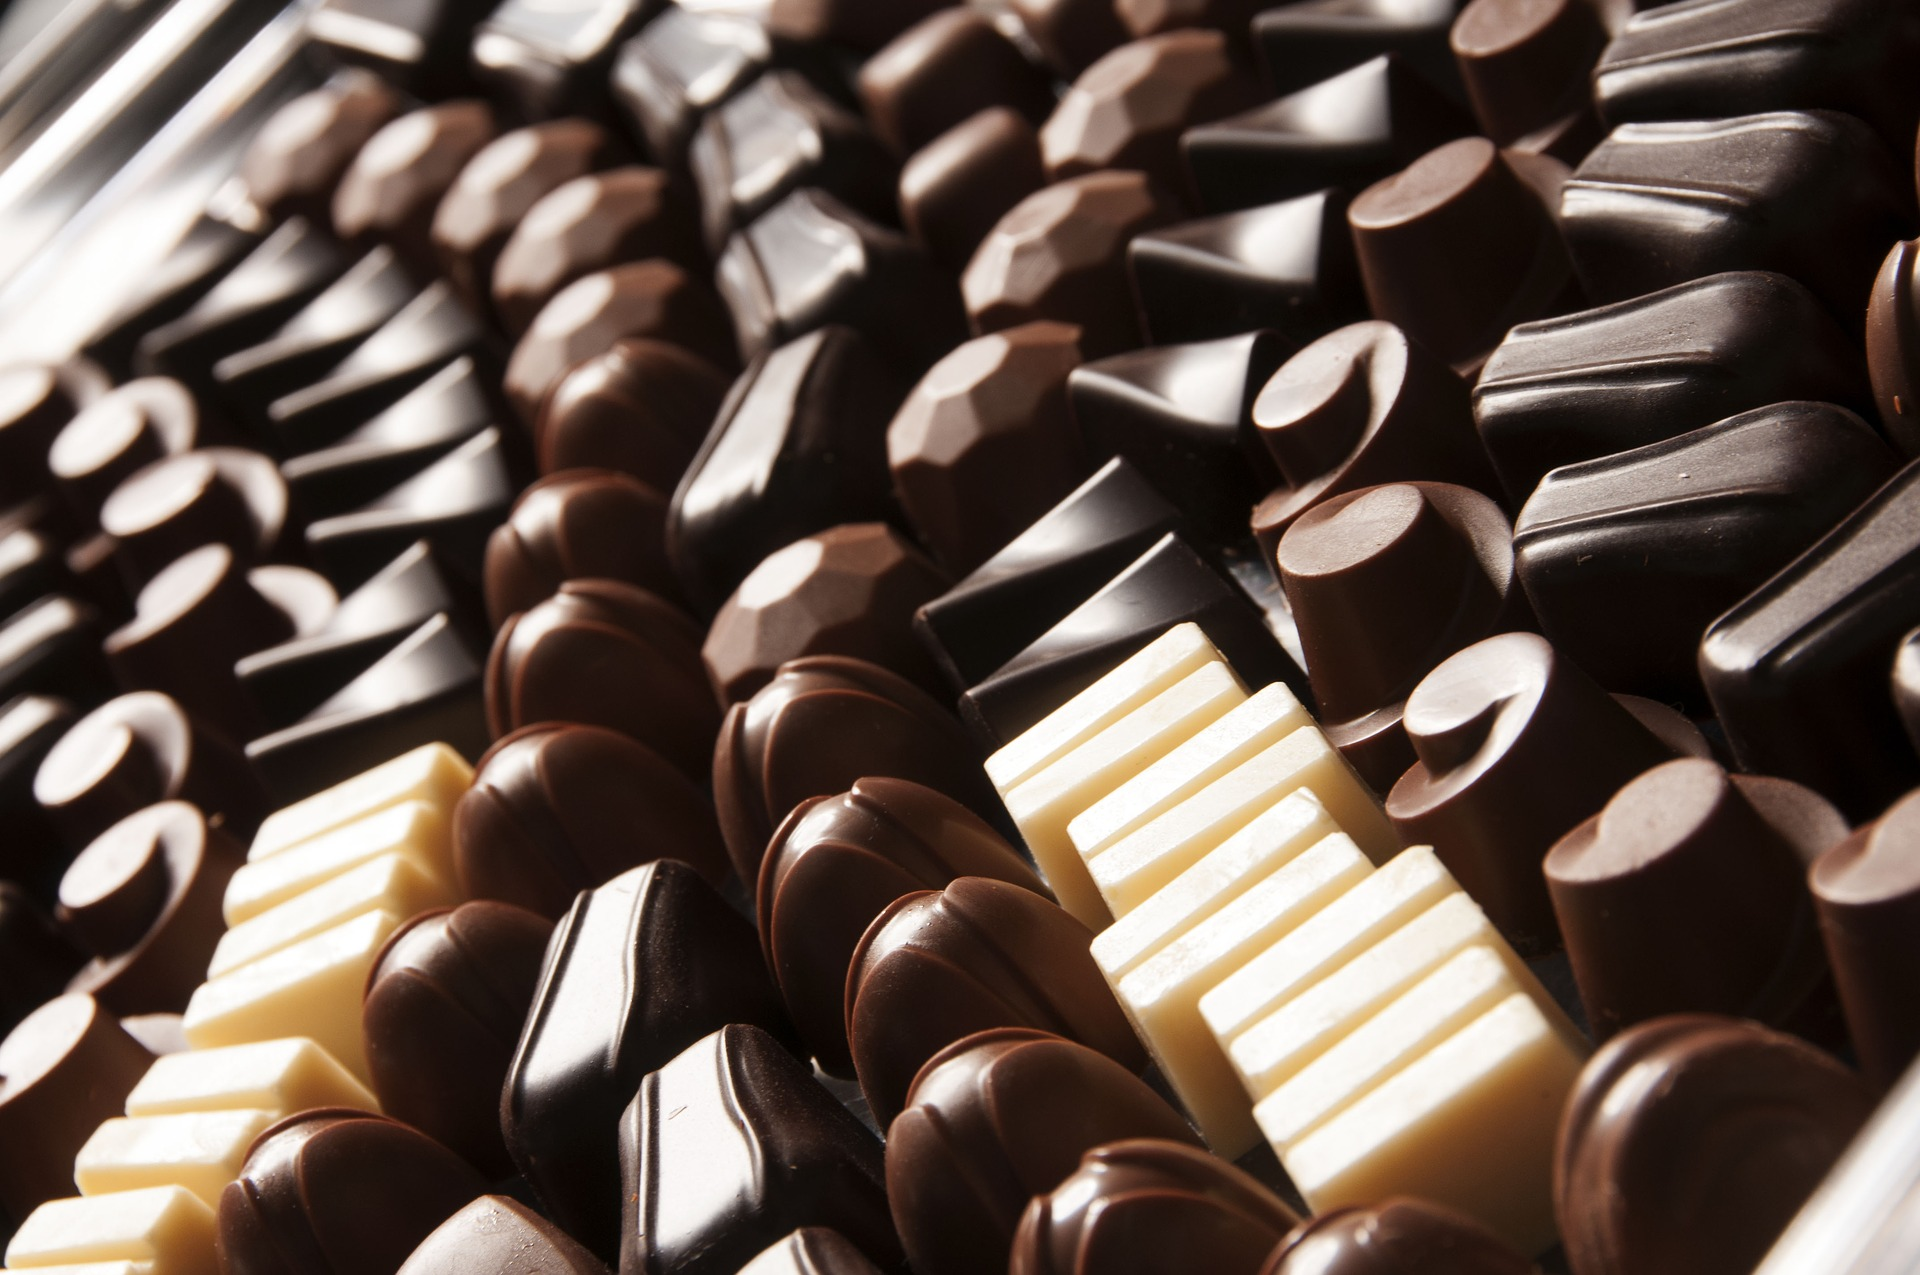 chocolate-2764581_1920_1516970621685.jpg